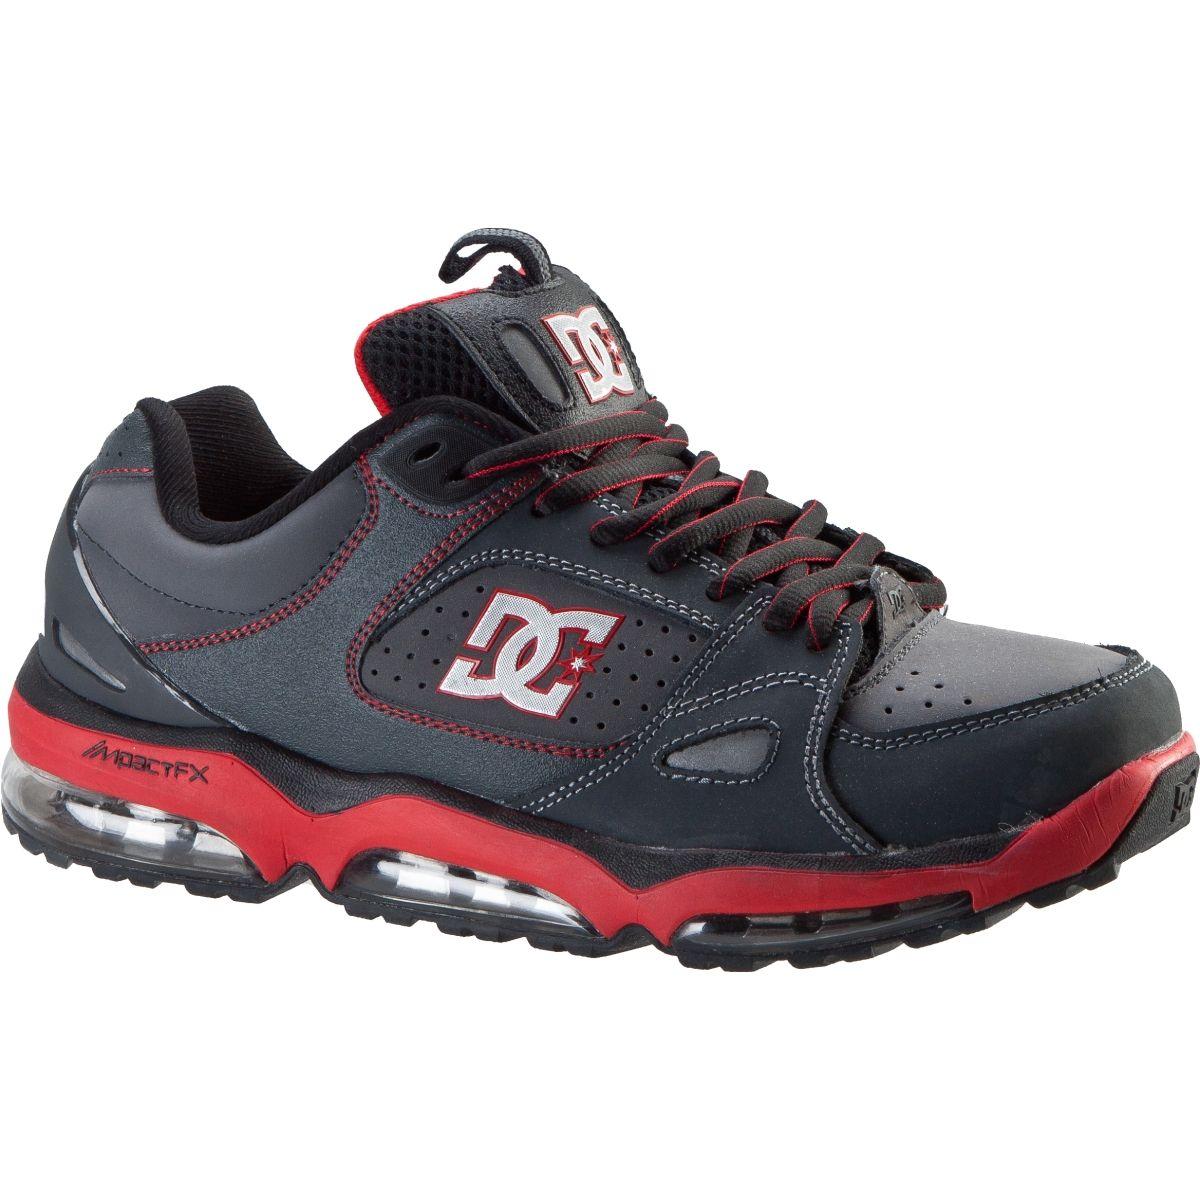 DC Versaflex 2 Skate Shoes Mens Shoes, Shoes mens, Skate